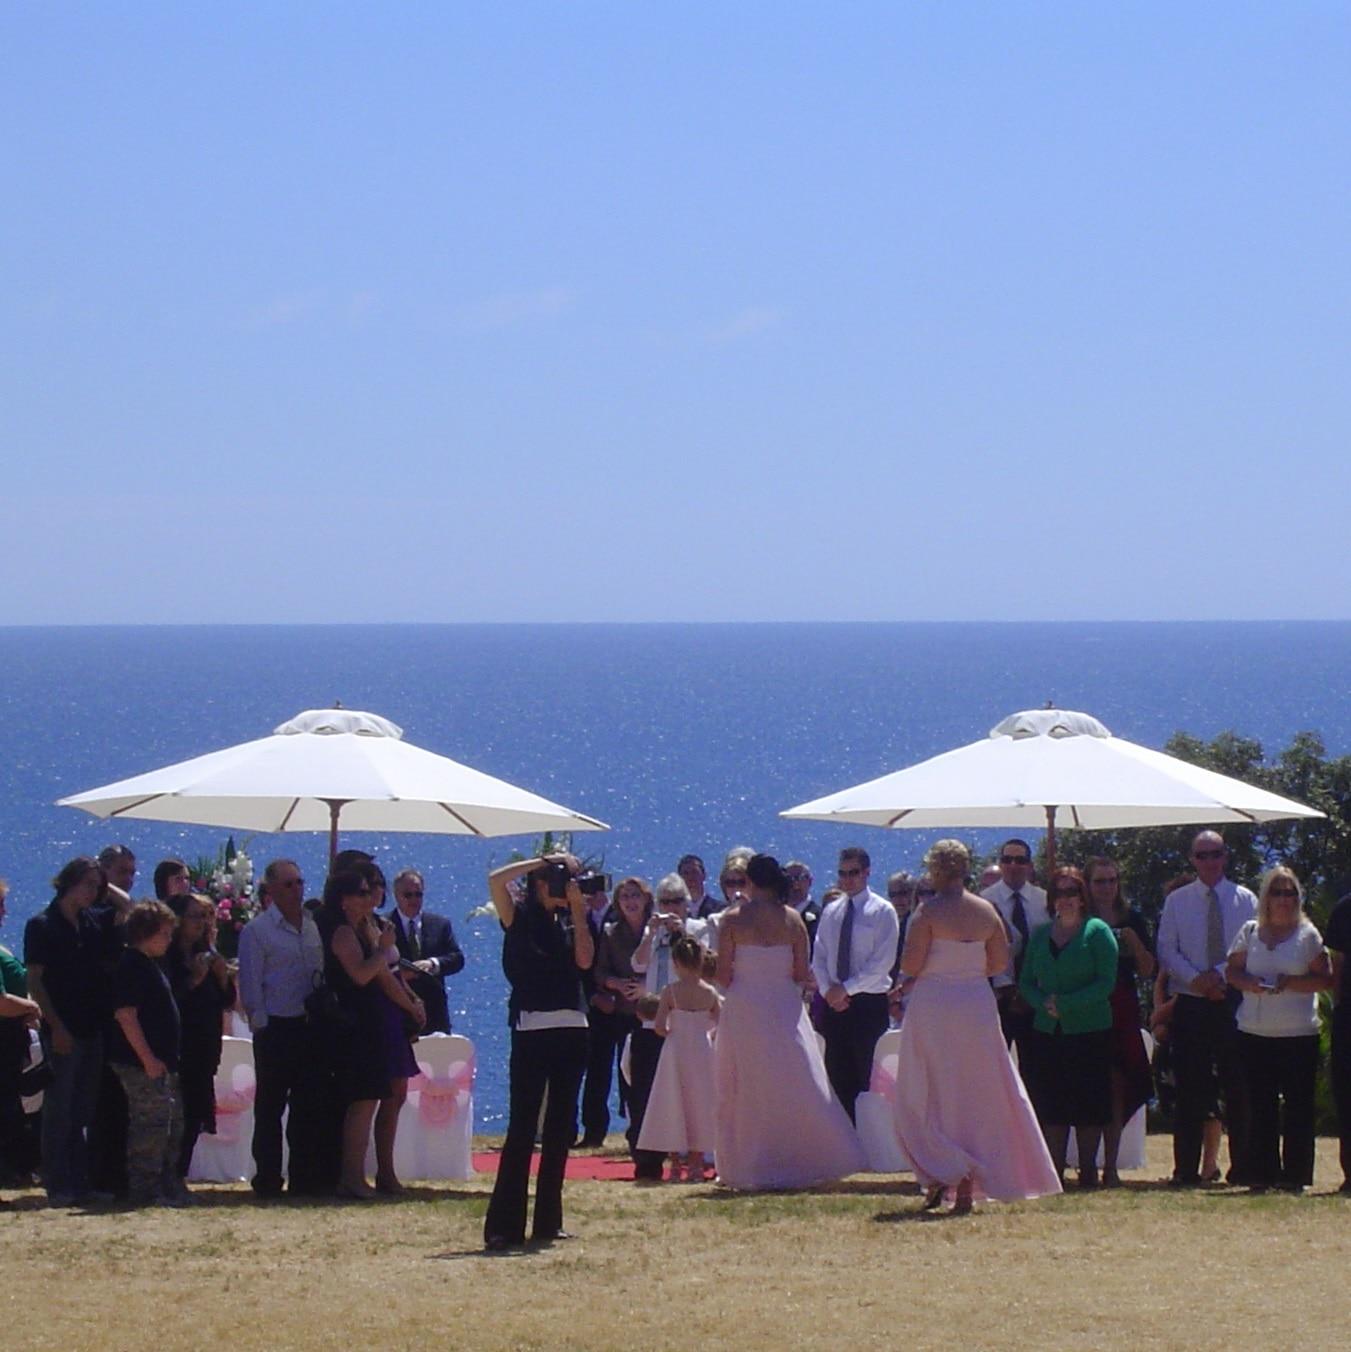 Wedding Hire Adelaide Beach wedding market umbrellas